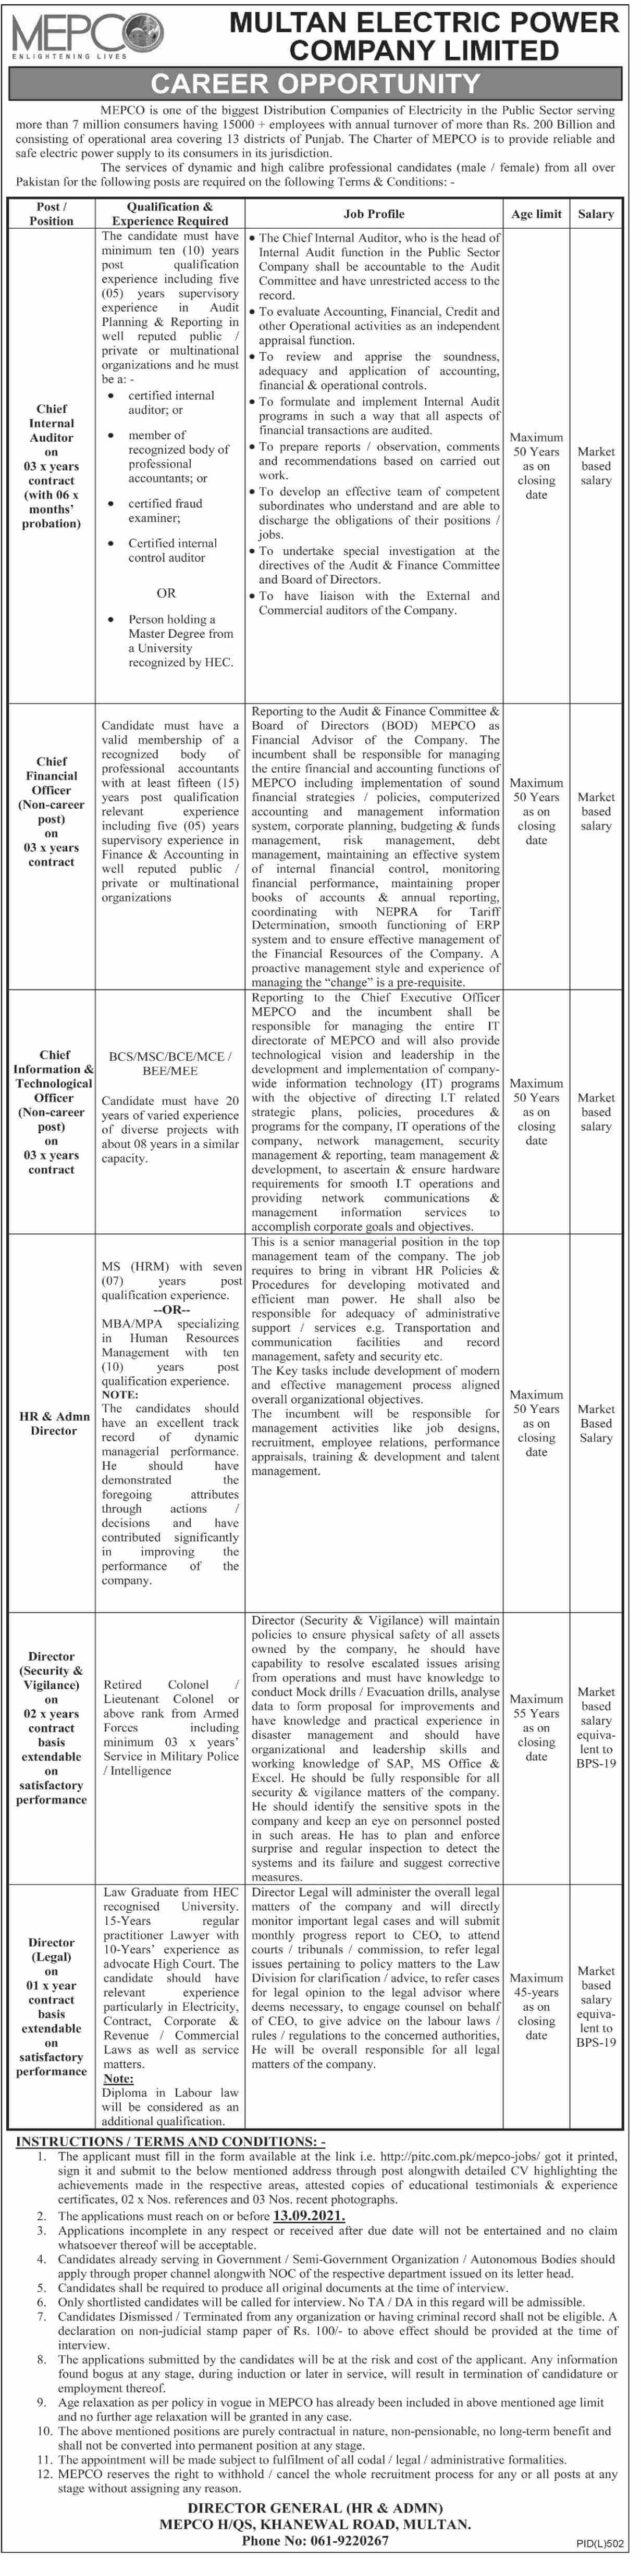 Multan Electric Power Company MEPCO Jobs 2021